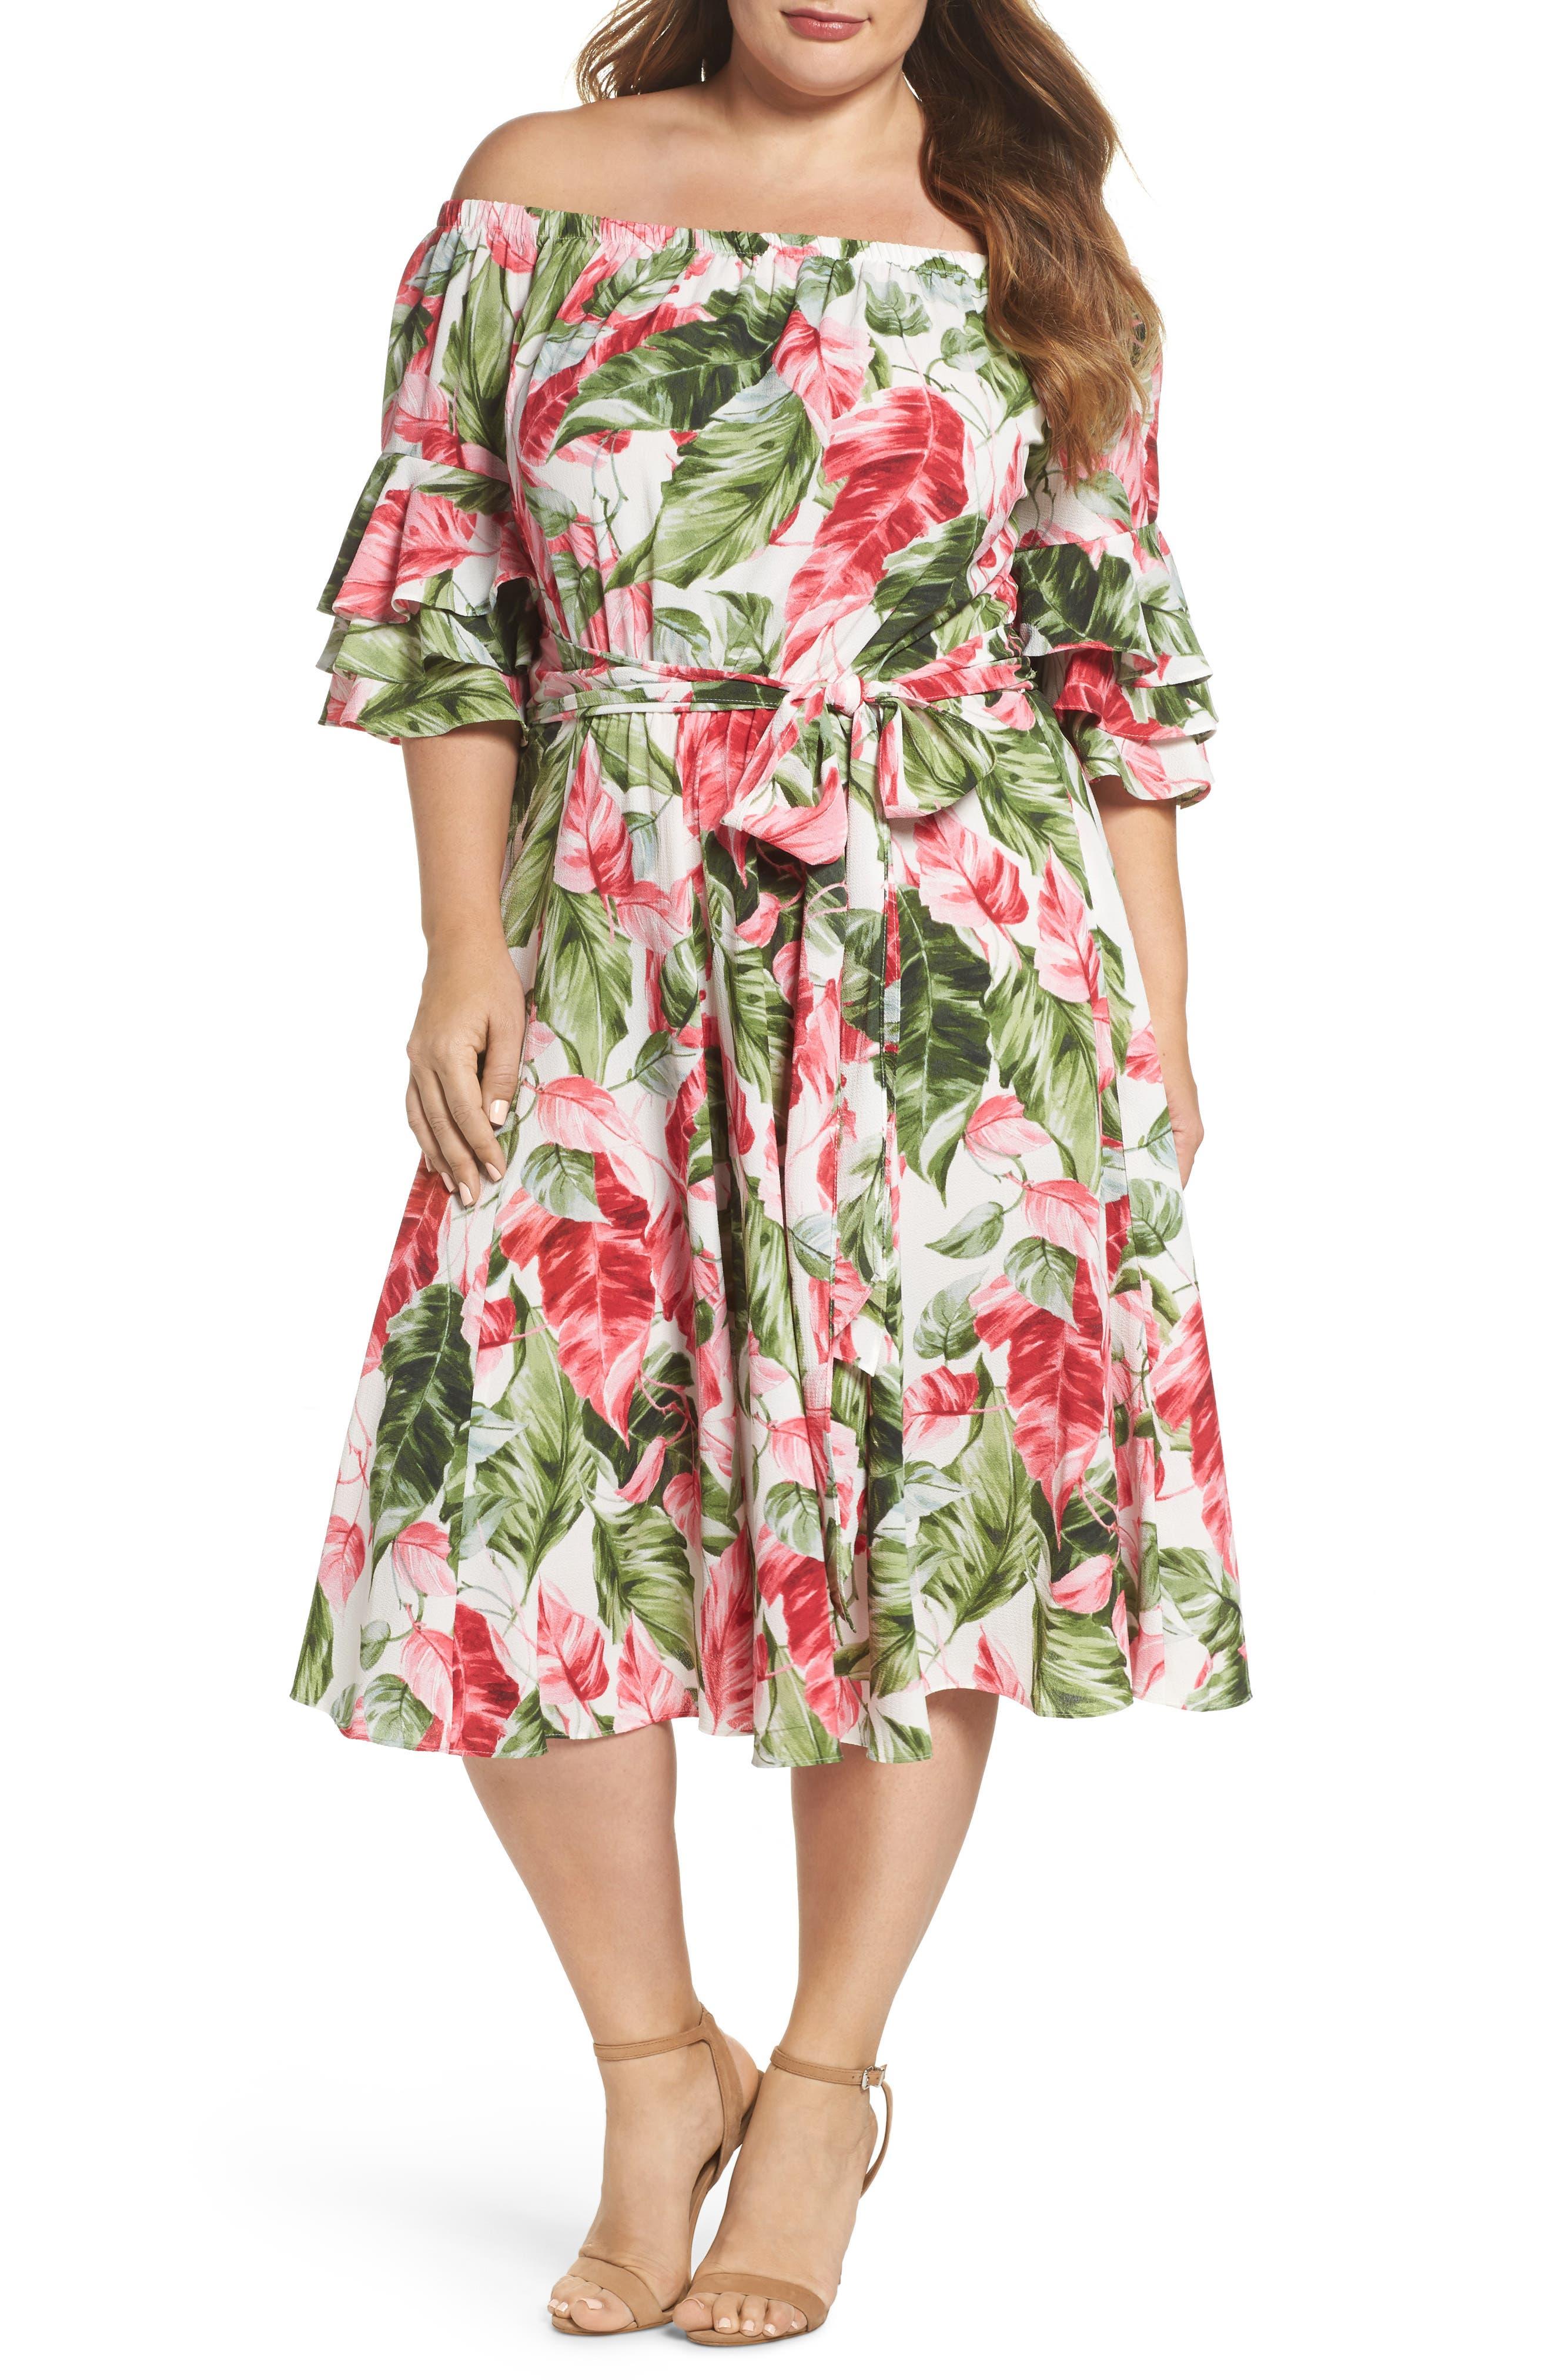 Off the Shoulder Floral Midi Dress,                         Main,                         color, Green/ Pink